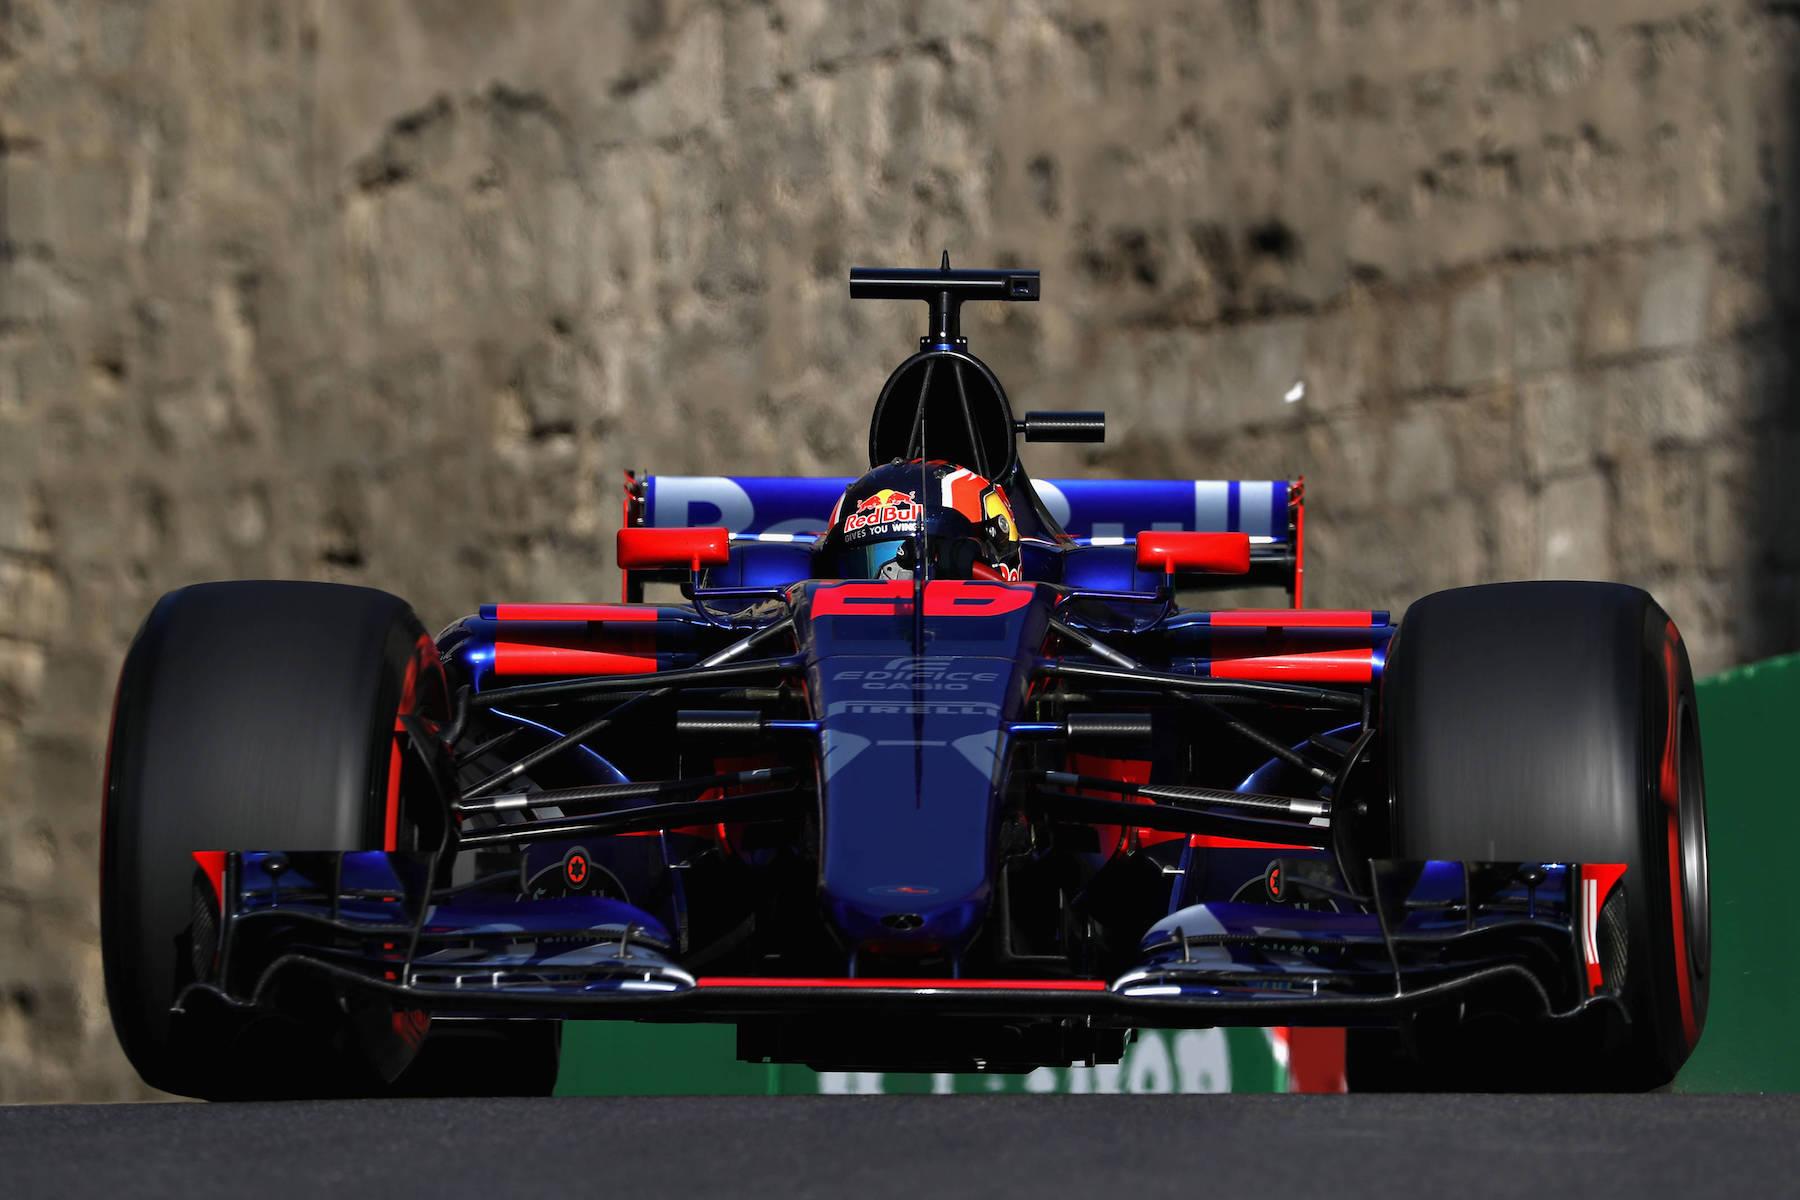 G 2017 Daniil Kvyat | Toro Rosso STR12 | 2017 Azerbaijan GP DNF 1 copy.jpg